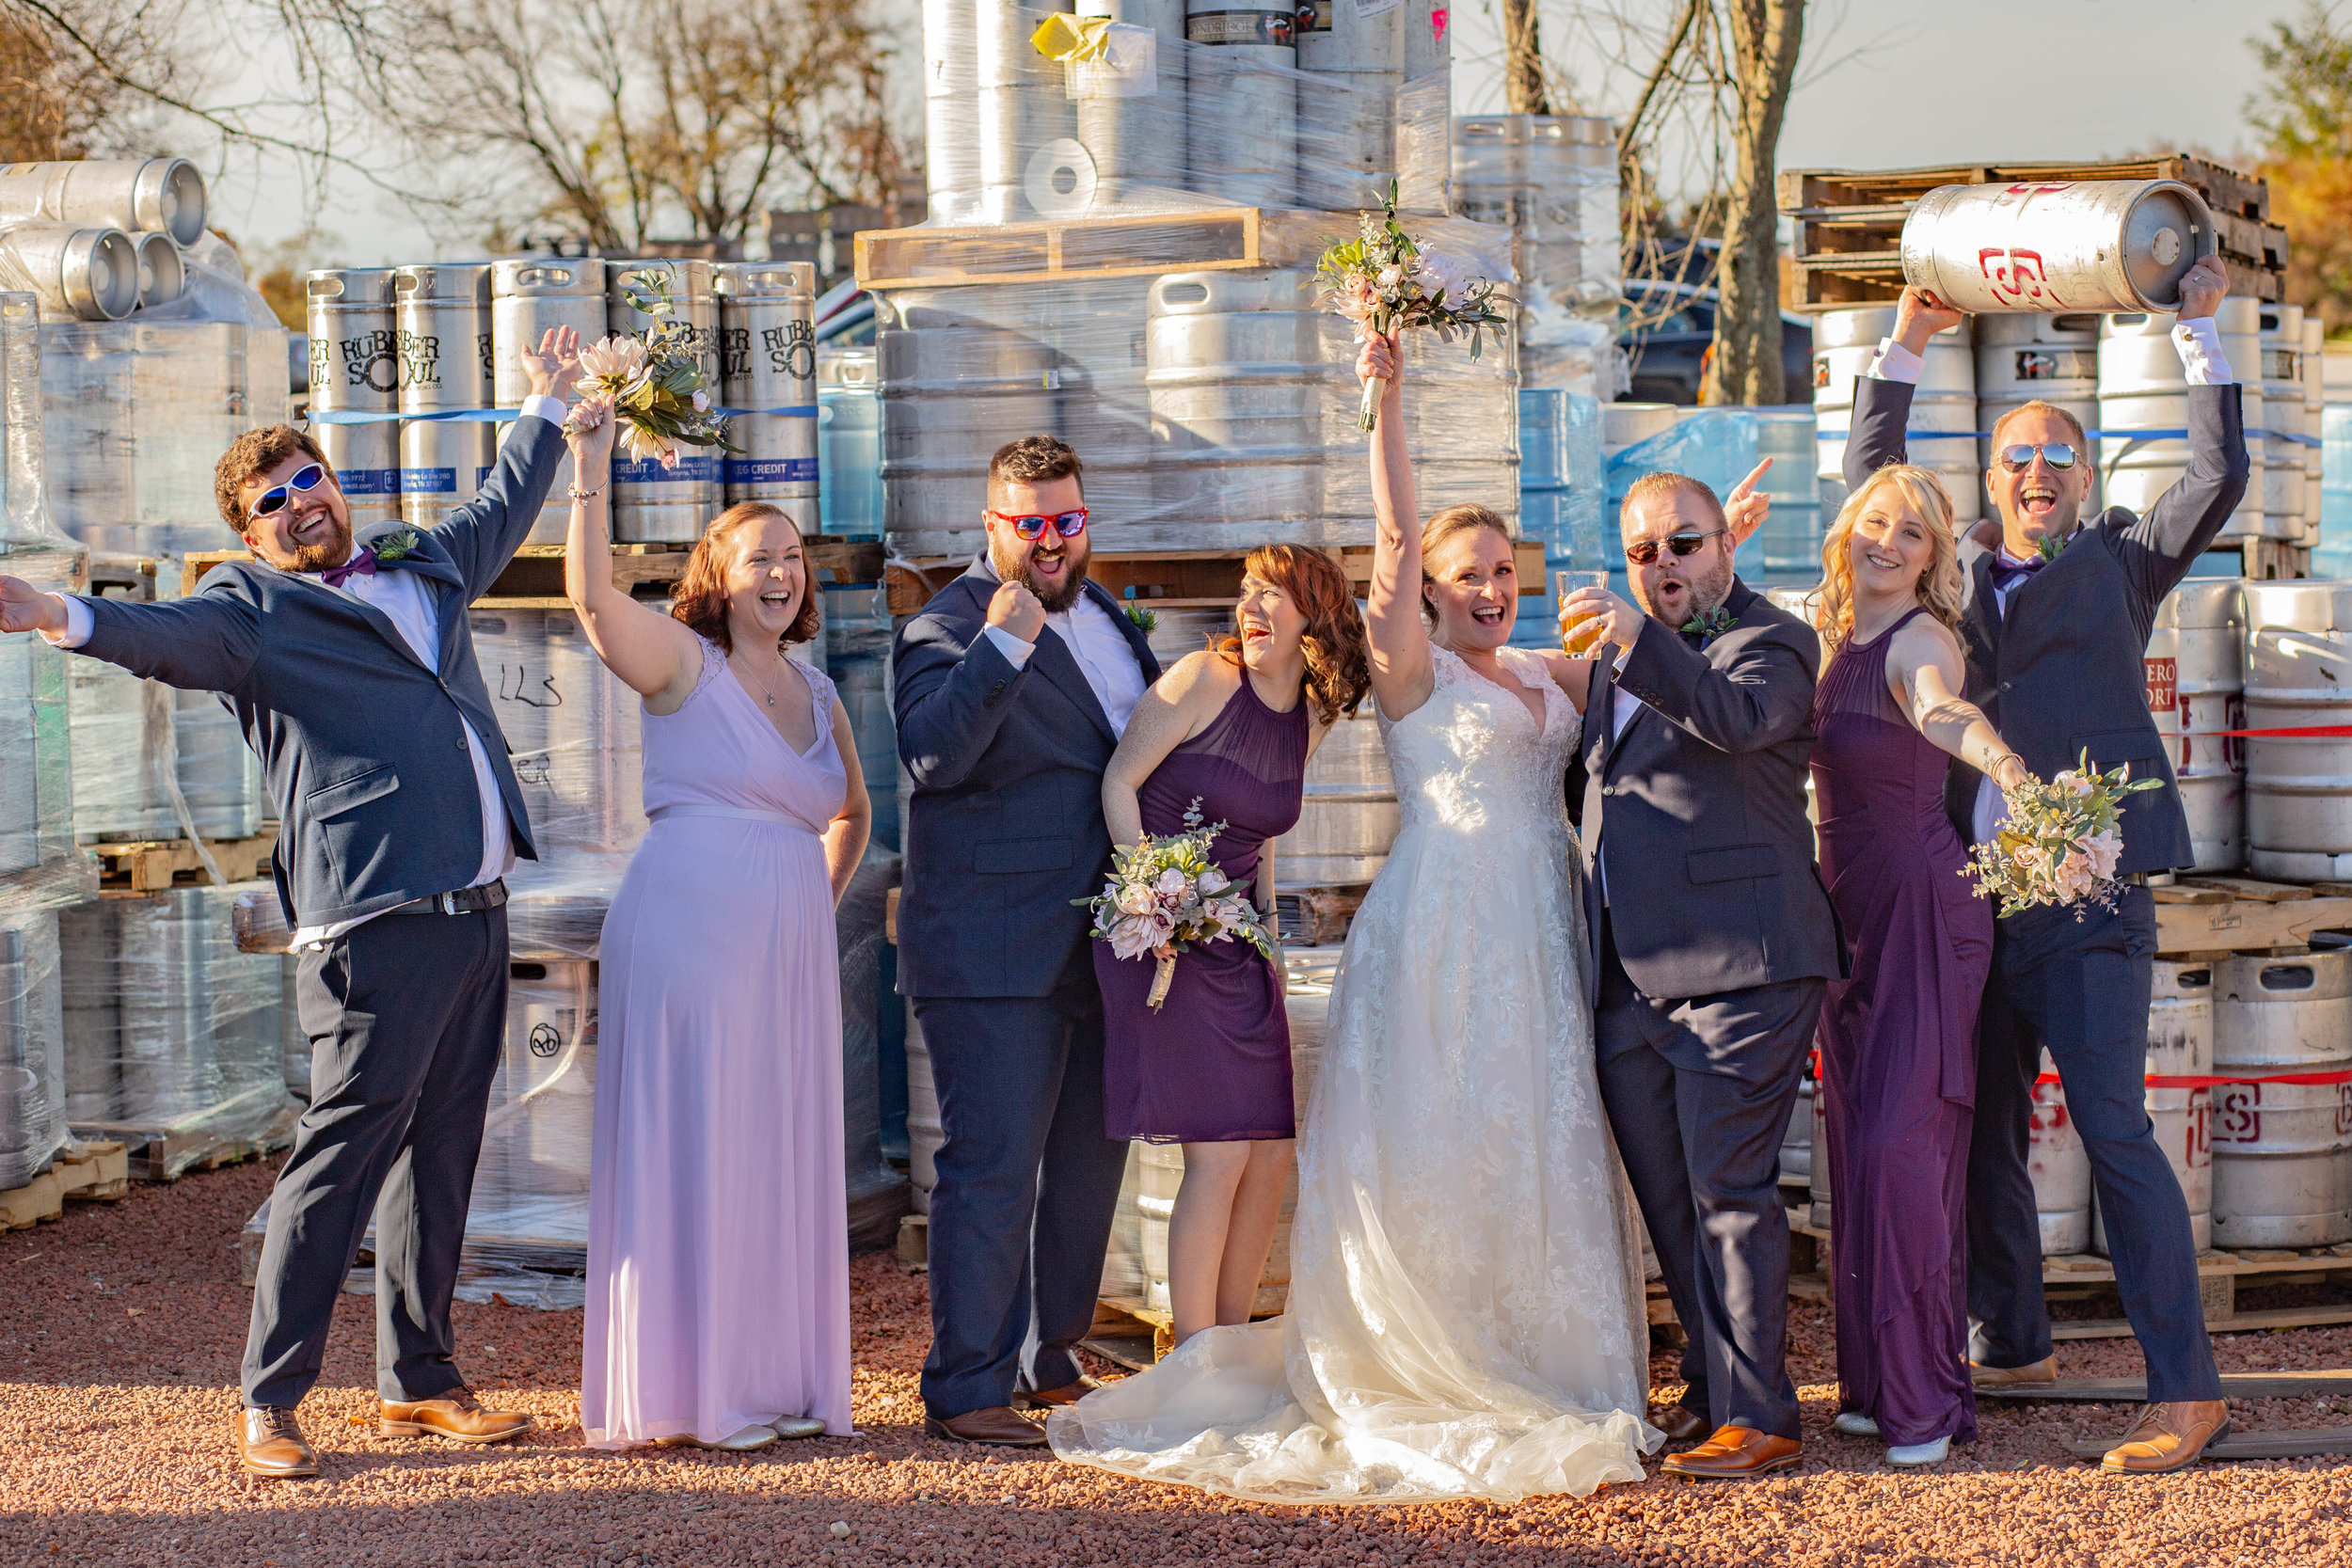 Cara & Steve wedding party